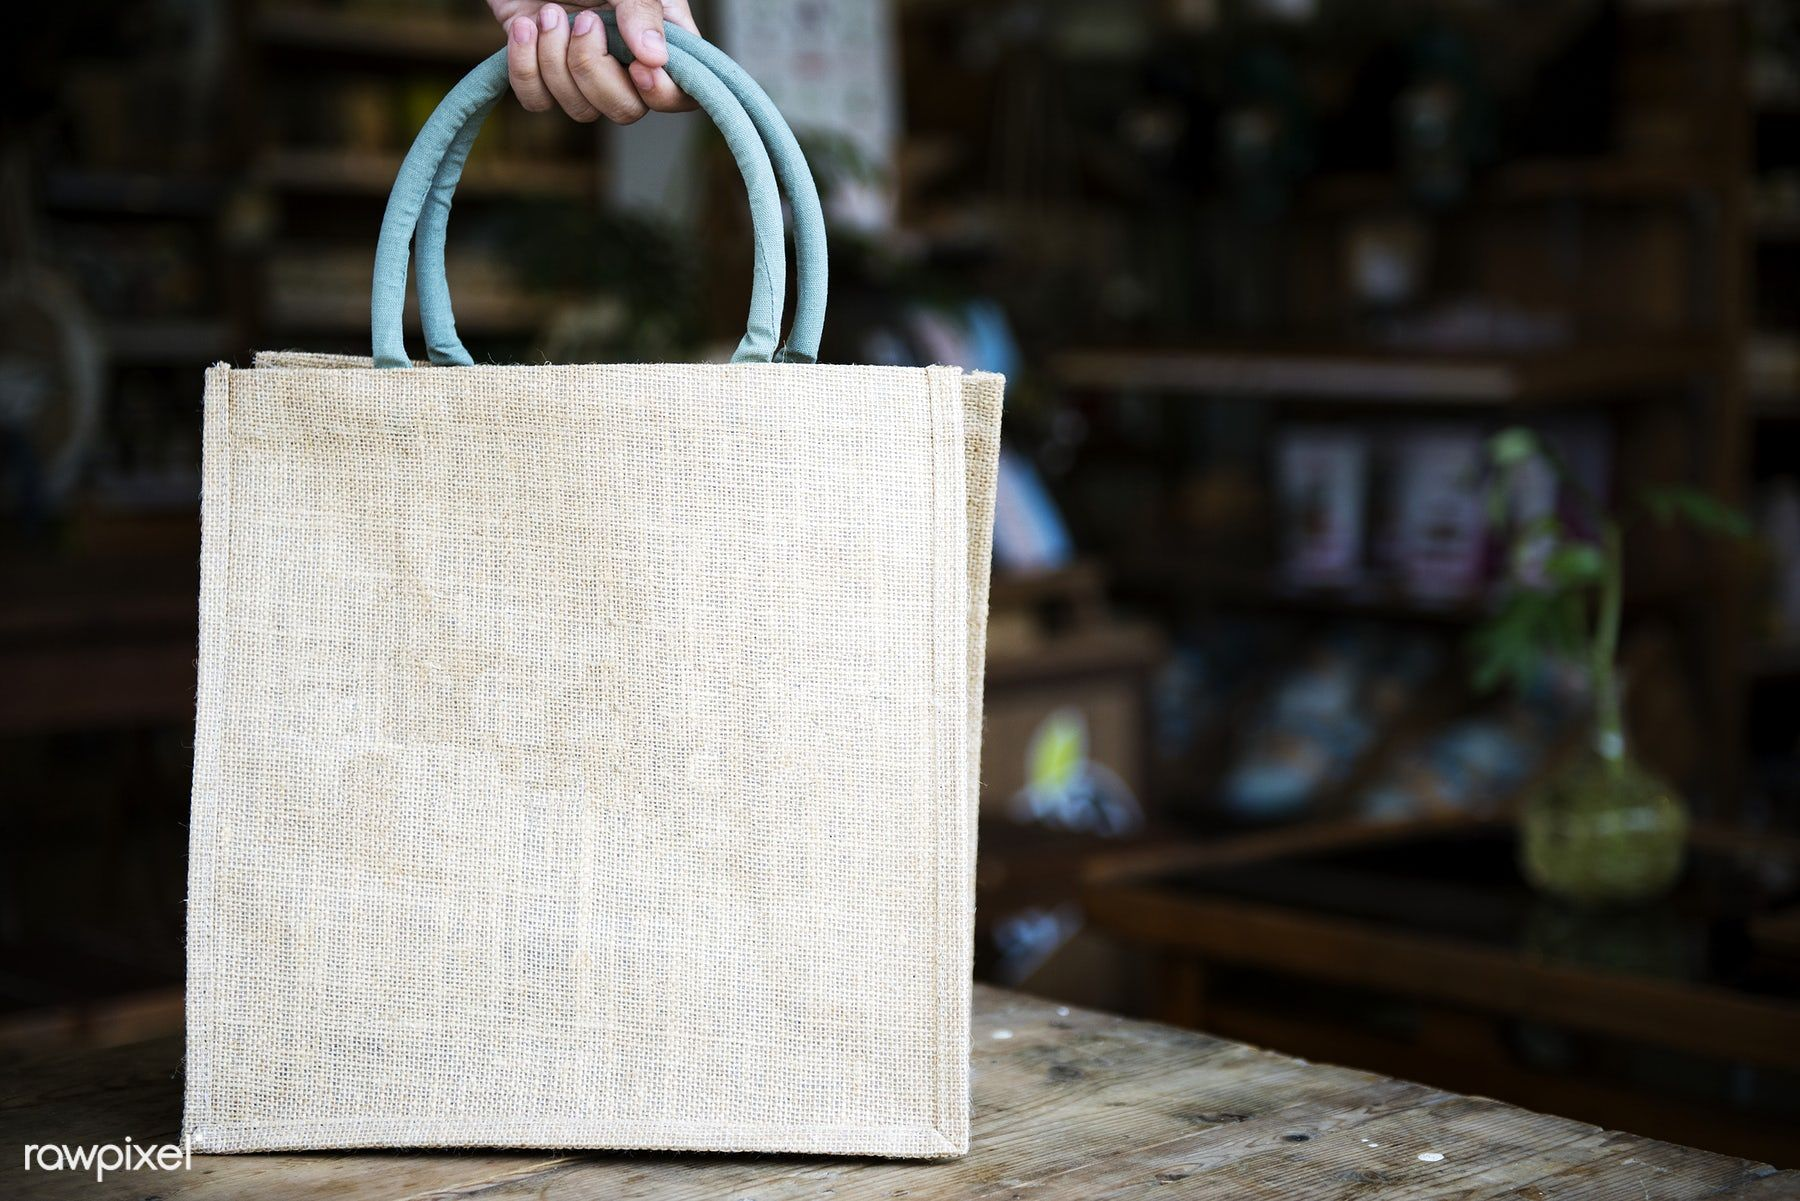 Download Download Premium Psd Of Design Space On Blank Tote Bag 295513 Blank Tote Bag Tote Bag Bags